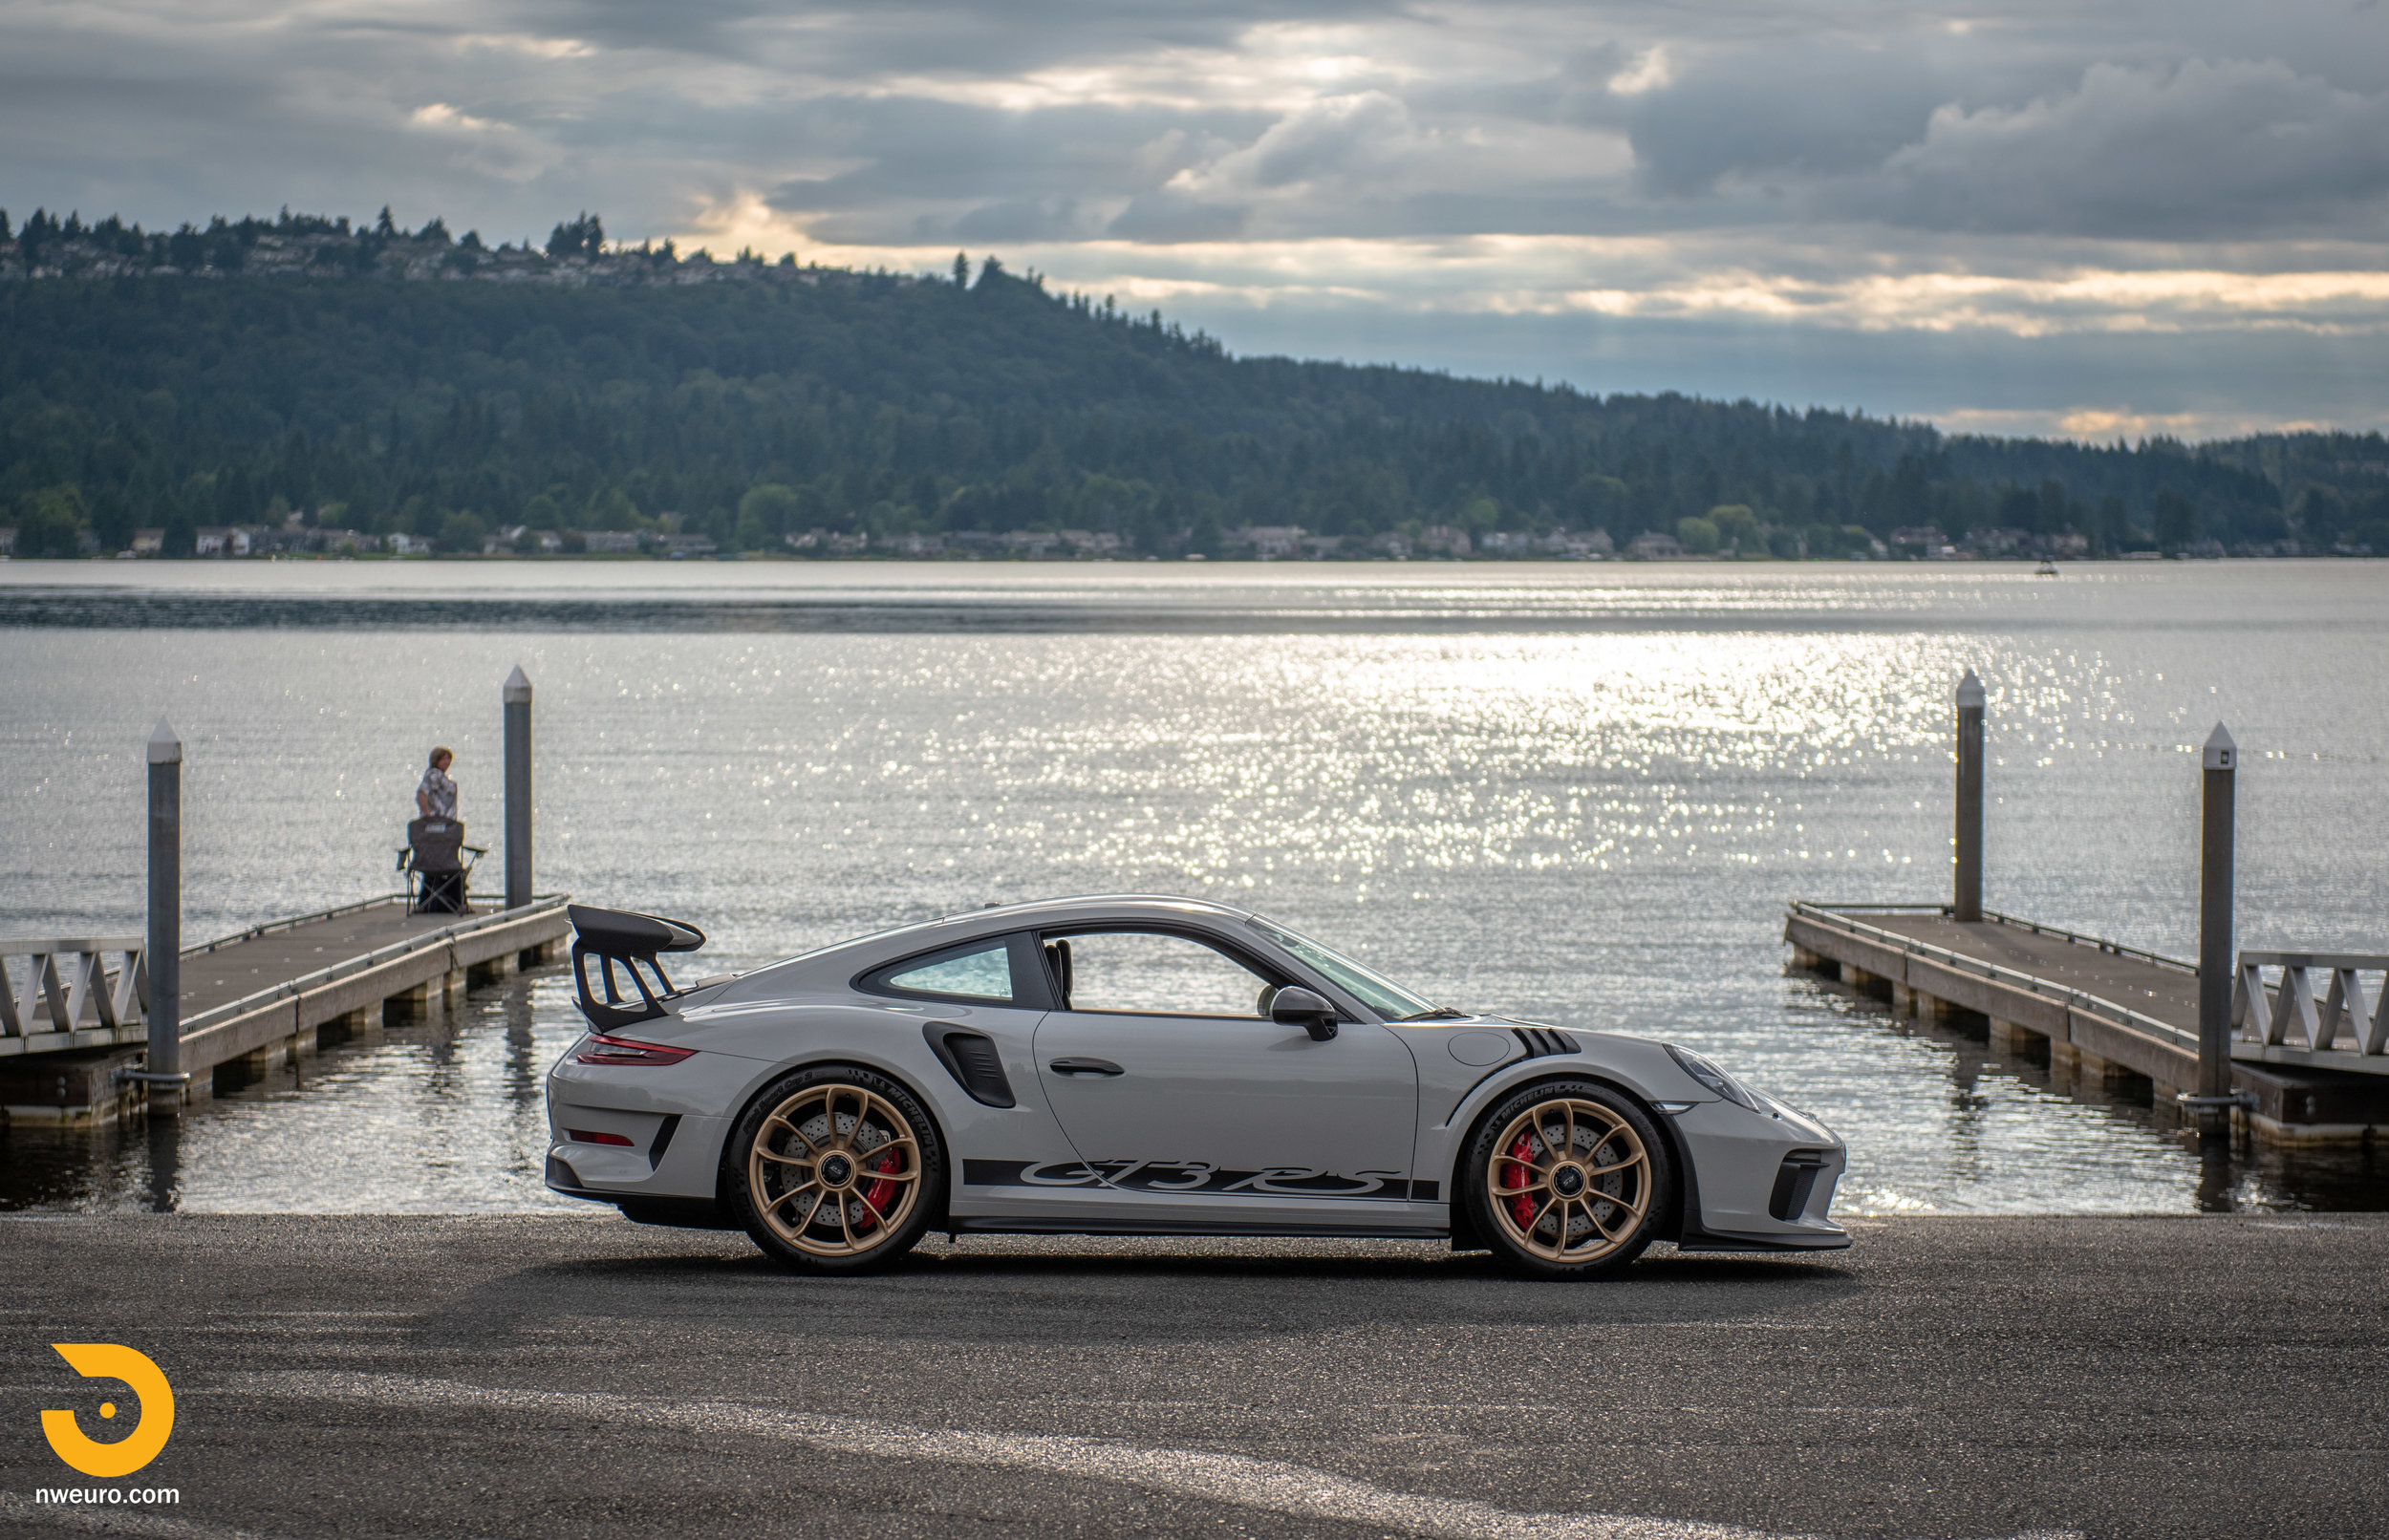 2019 Porsche GT3 RS - Chalk-2.jpg